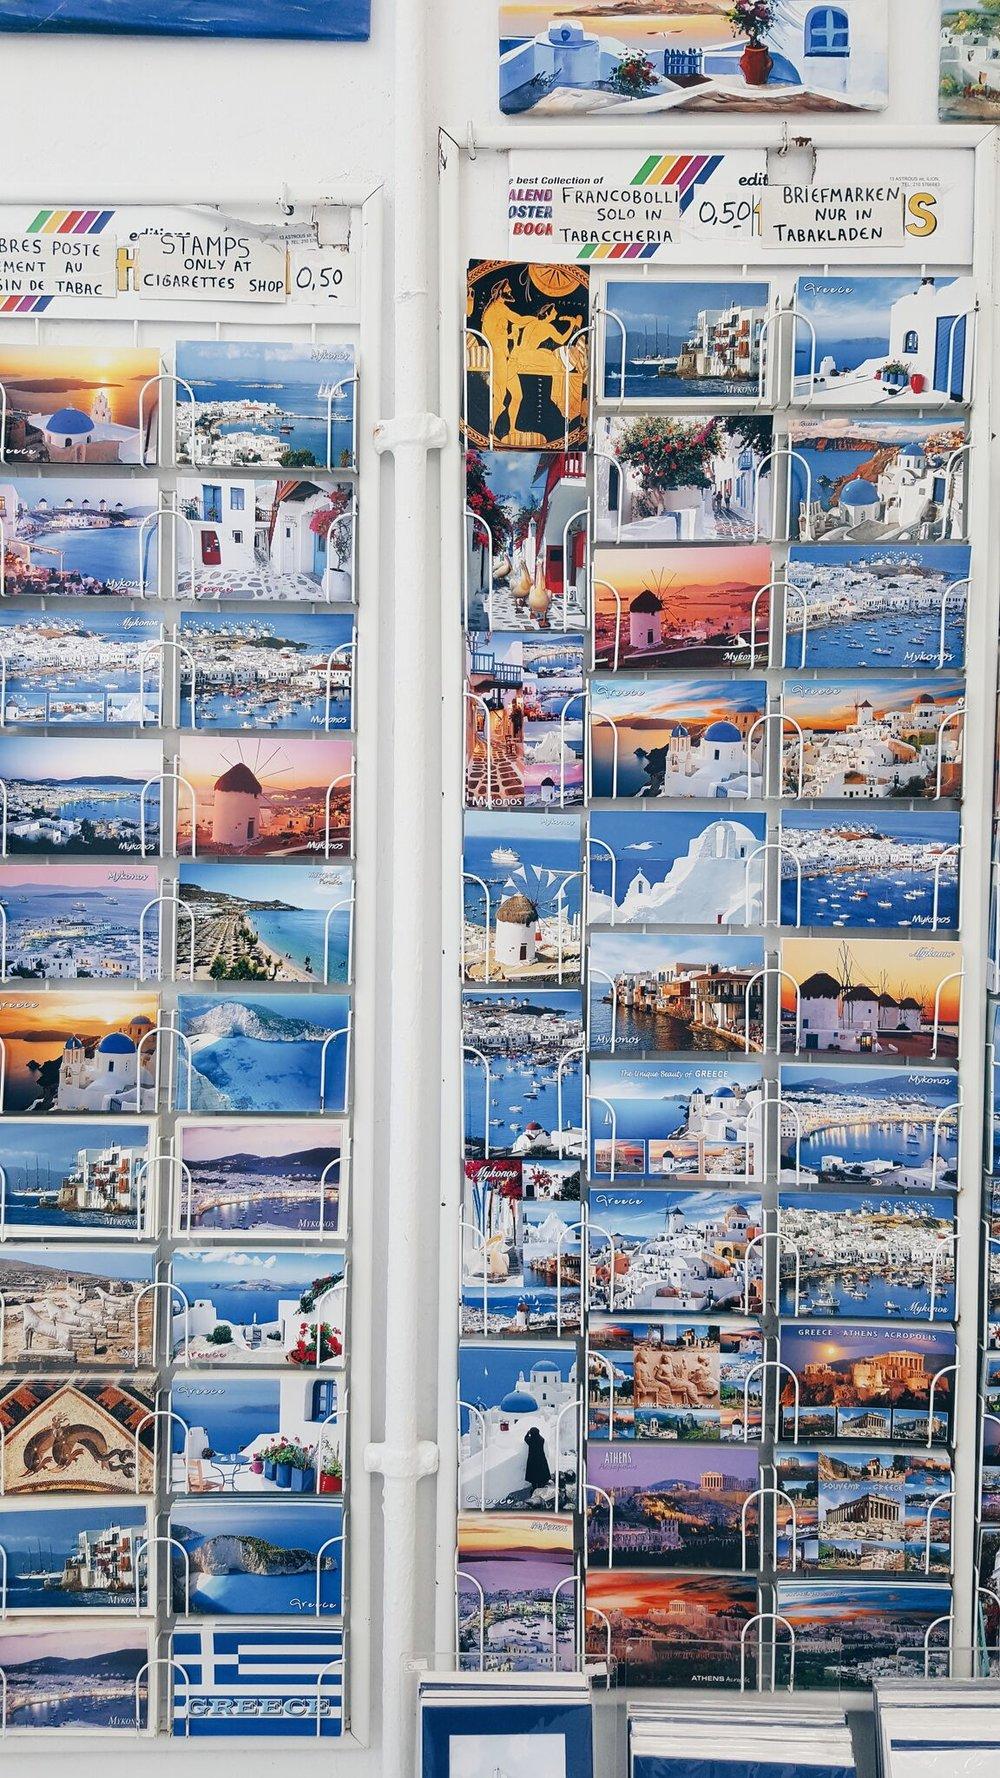 Postcards from Mykonos